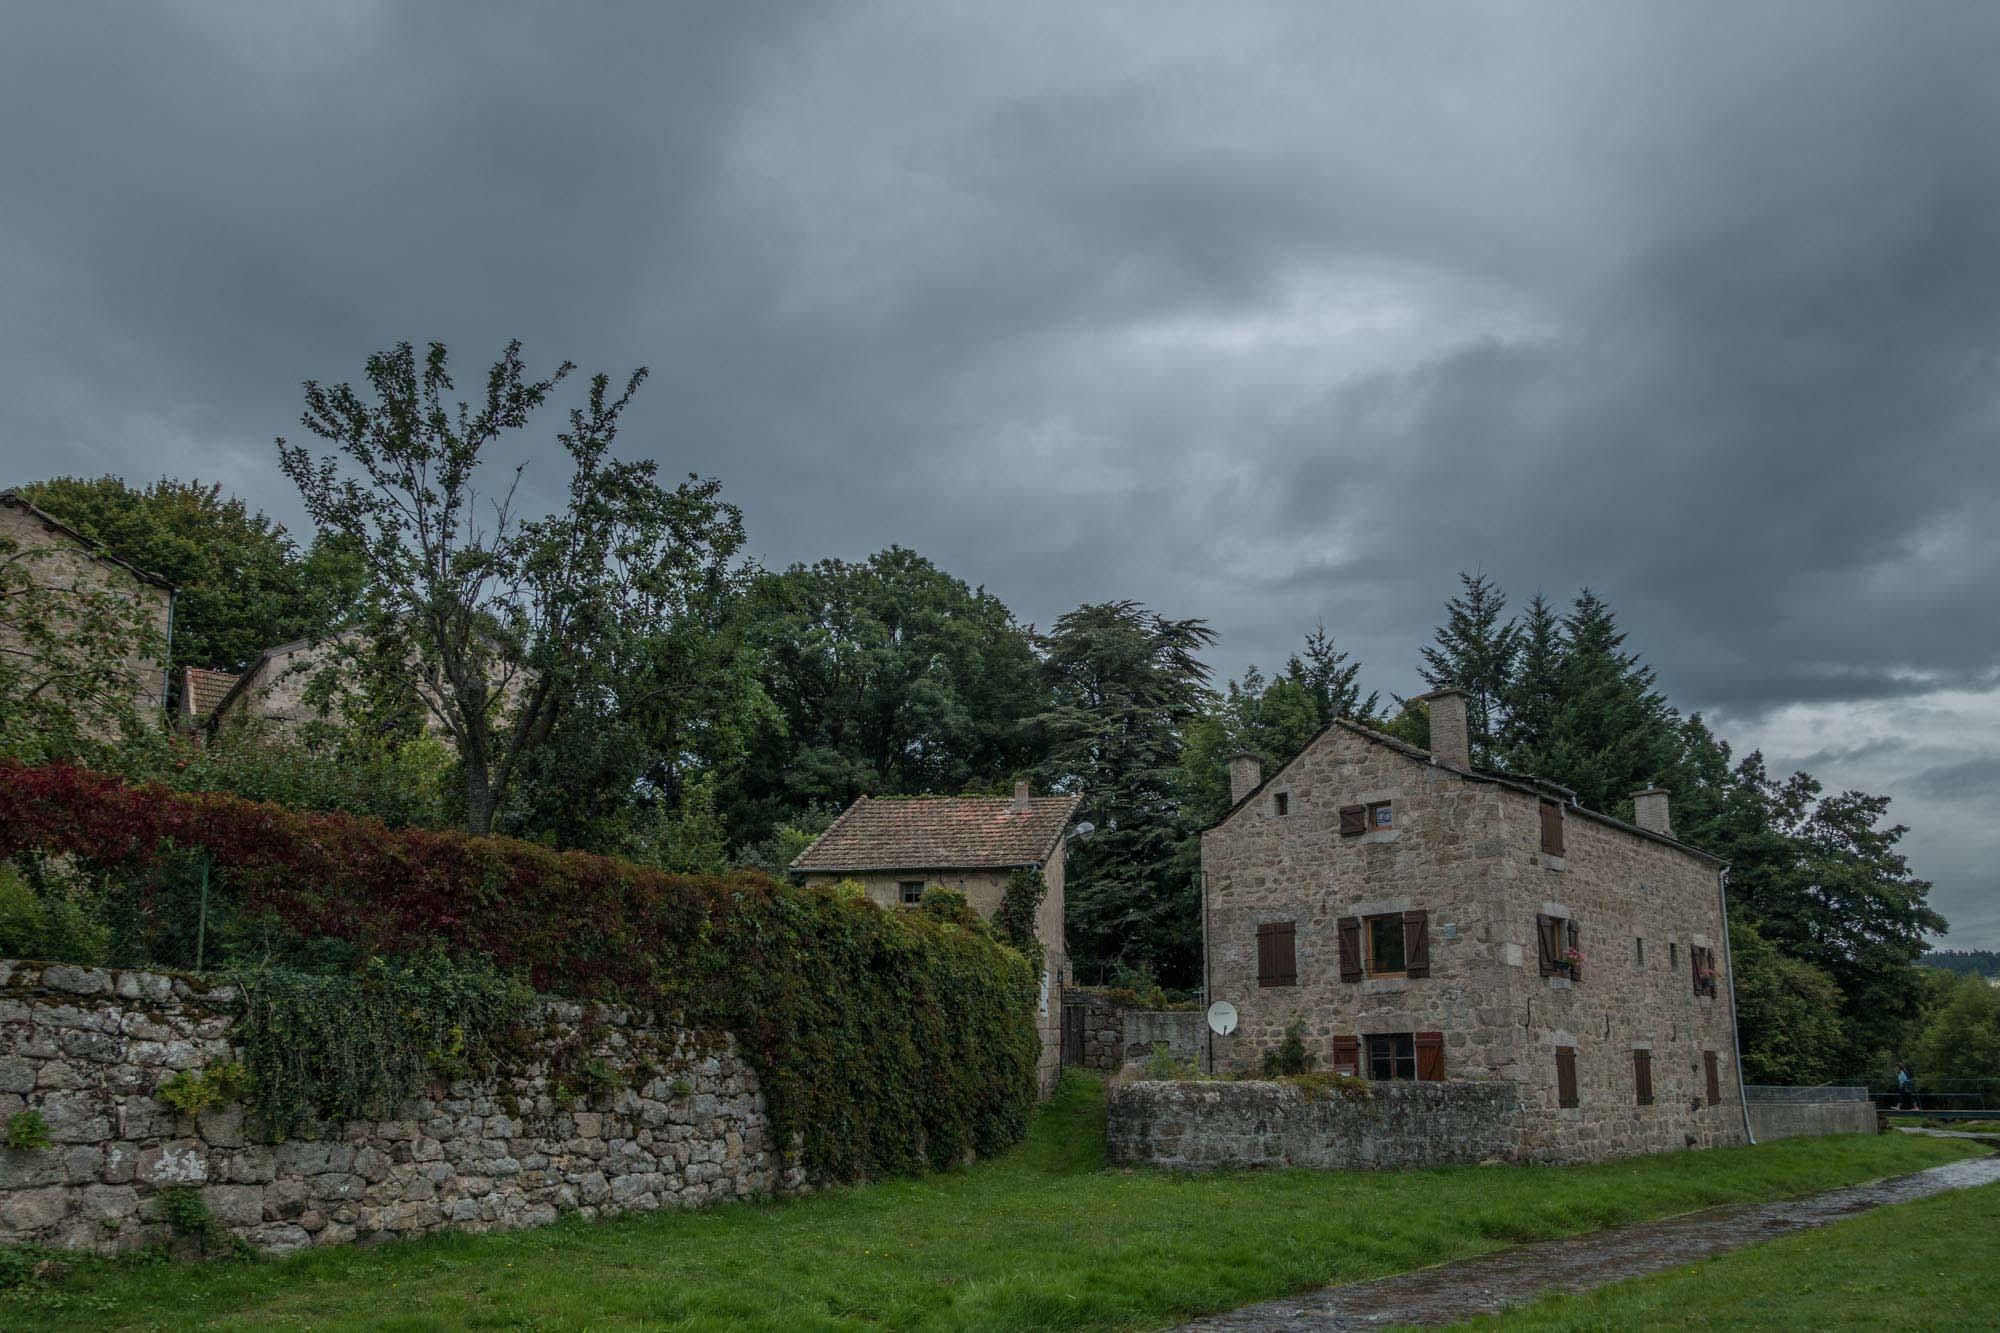 Camino Santiago Mtb Via Gebennensis Tence Via Gebennensis Auvergne